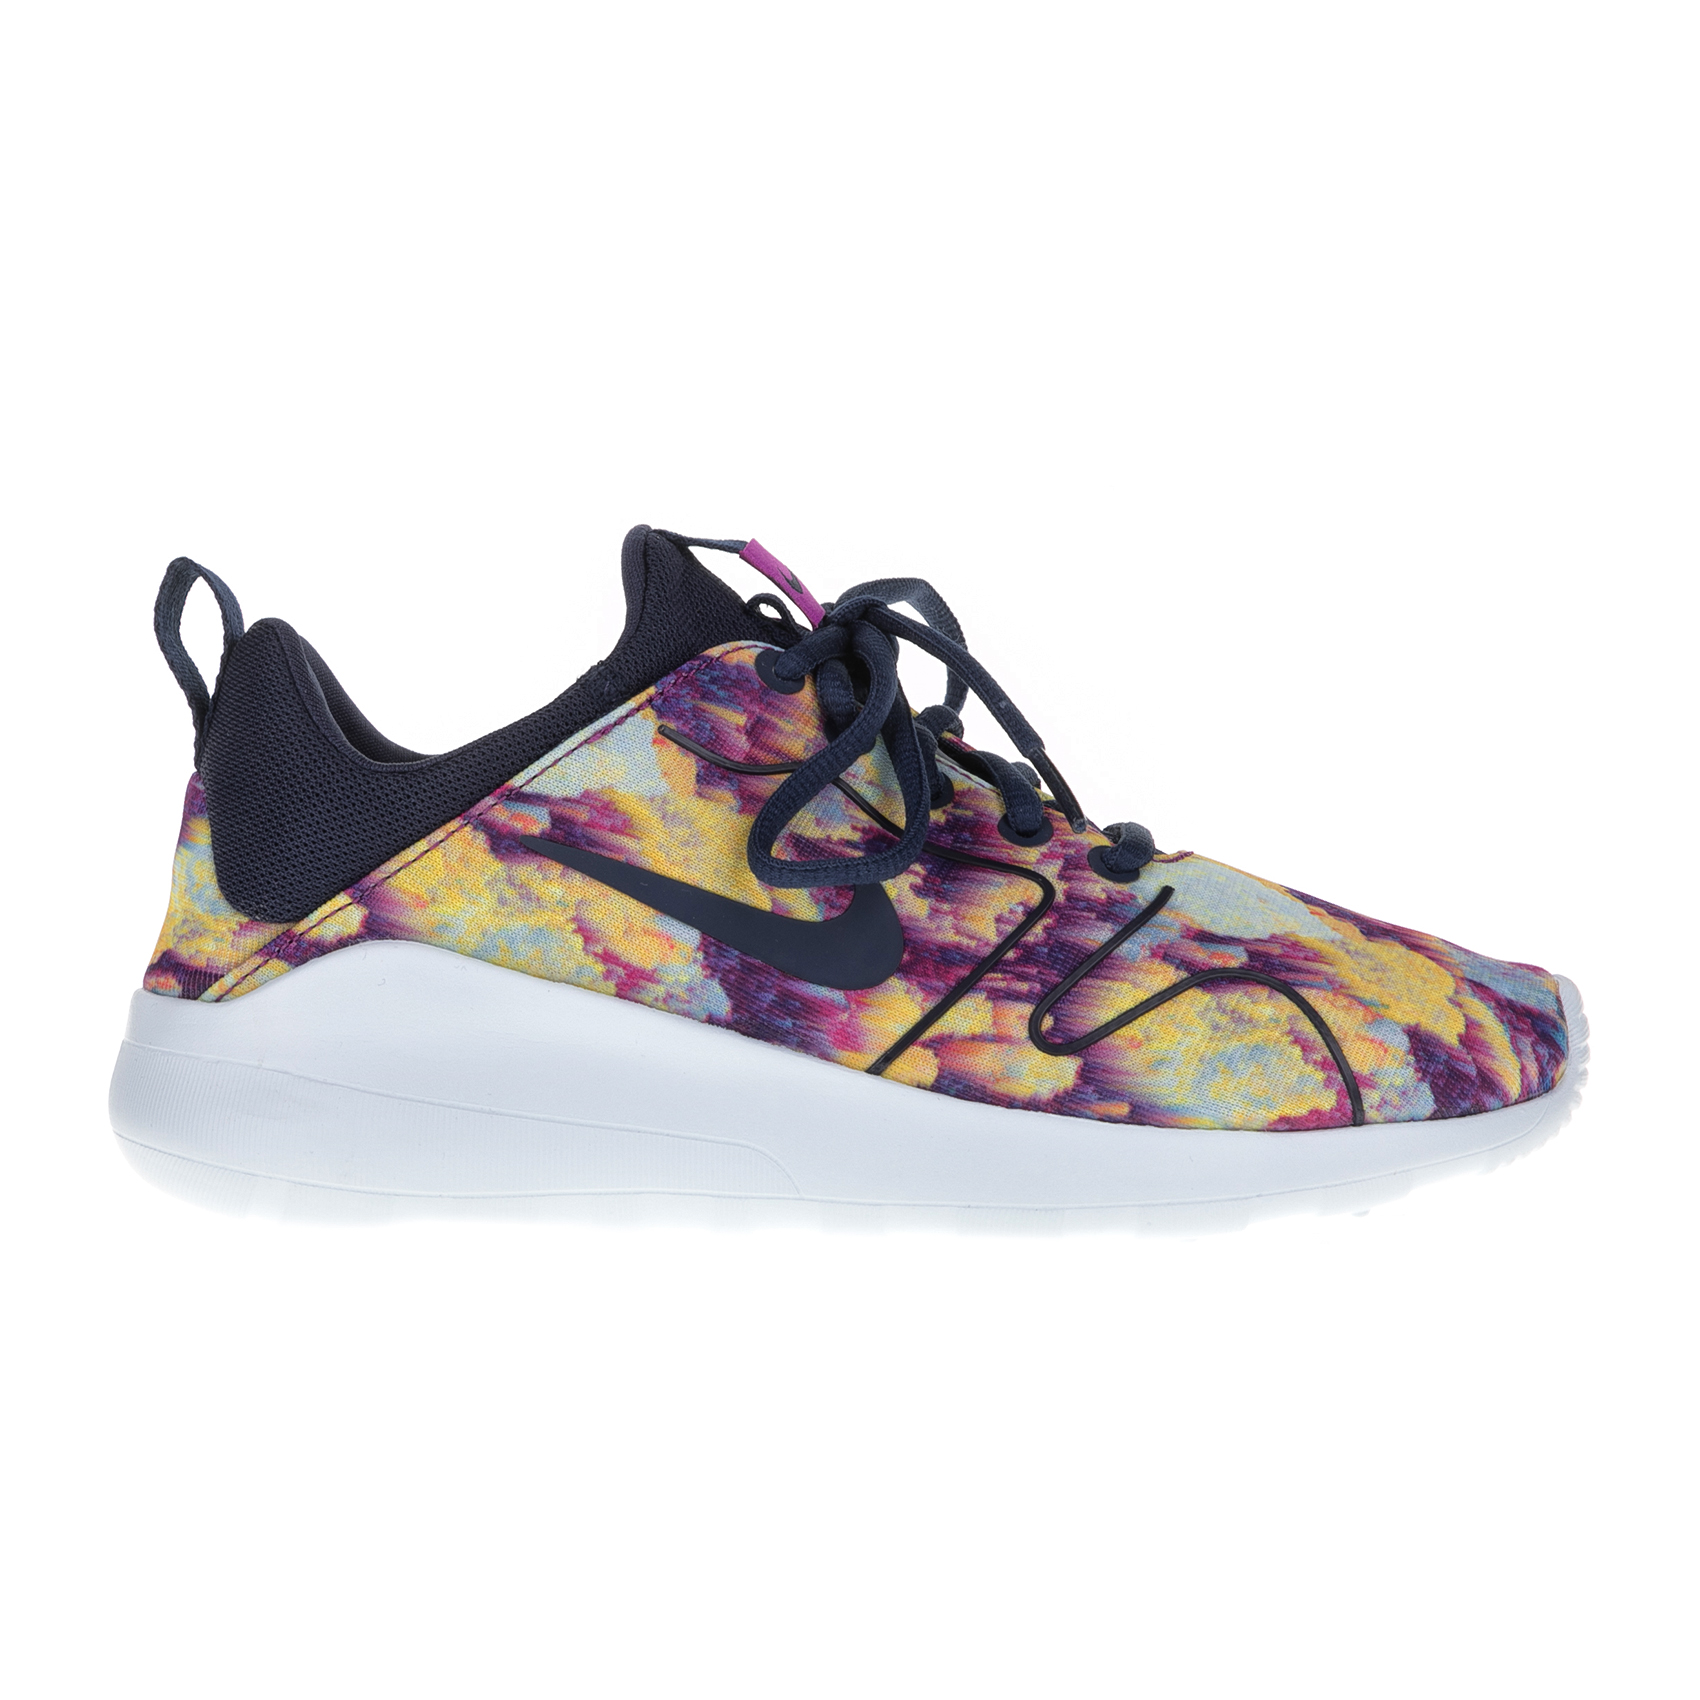 NIKE – Γυναικεία αθλητικά παπούτσια Nike KAISHI 2.0 PRINT μαύρα – κίτρινα